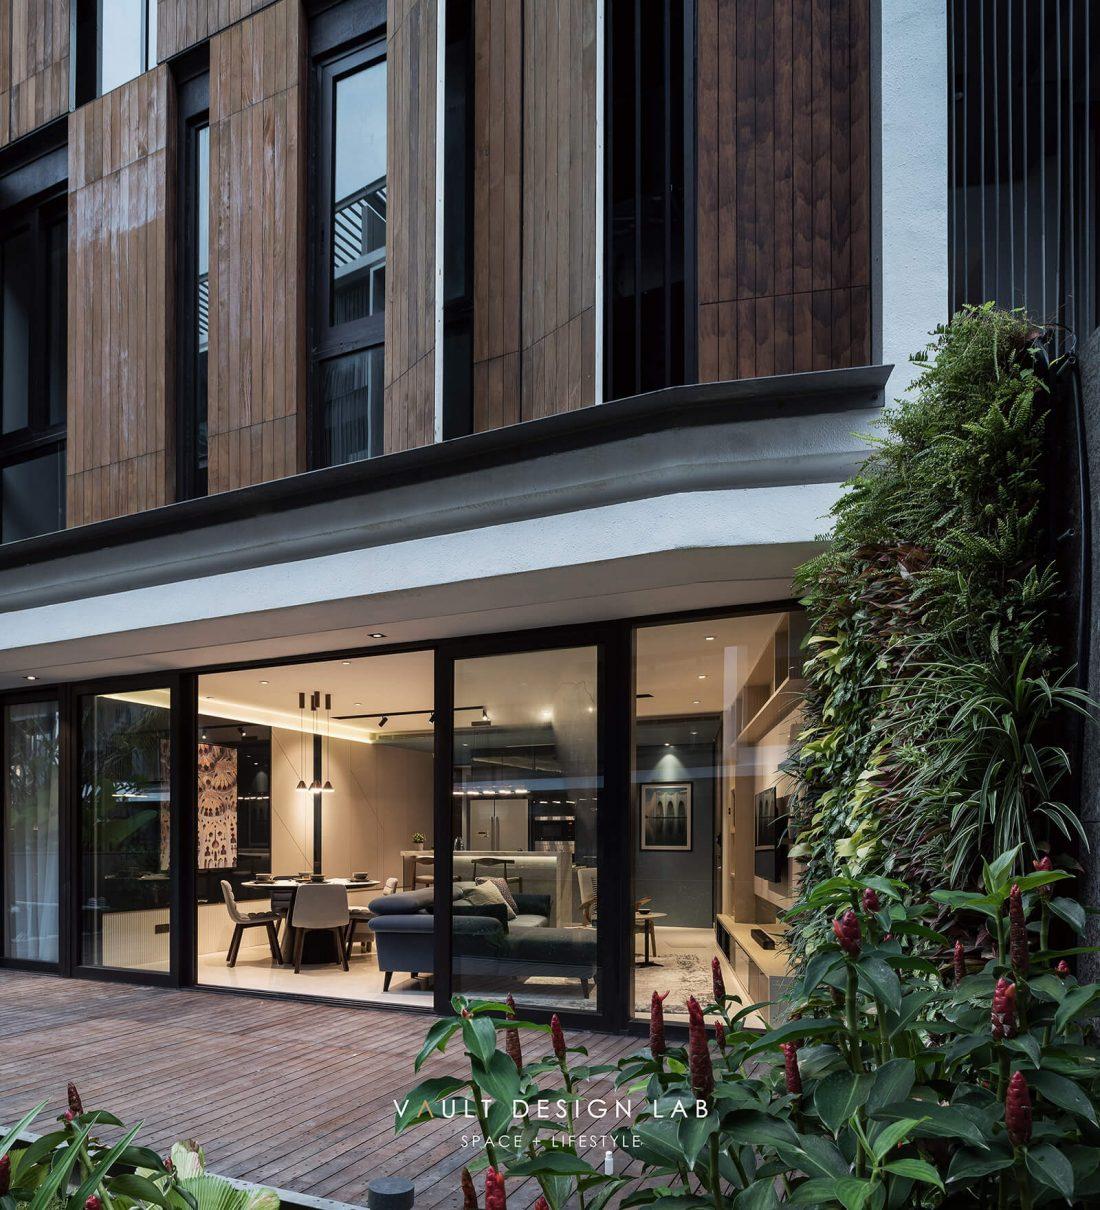 Interior-Design-Shorefront-Condominium-Ytl-Penang-Malaysia-Exterior-Design-v2